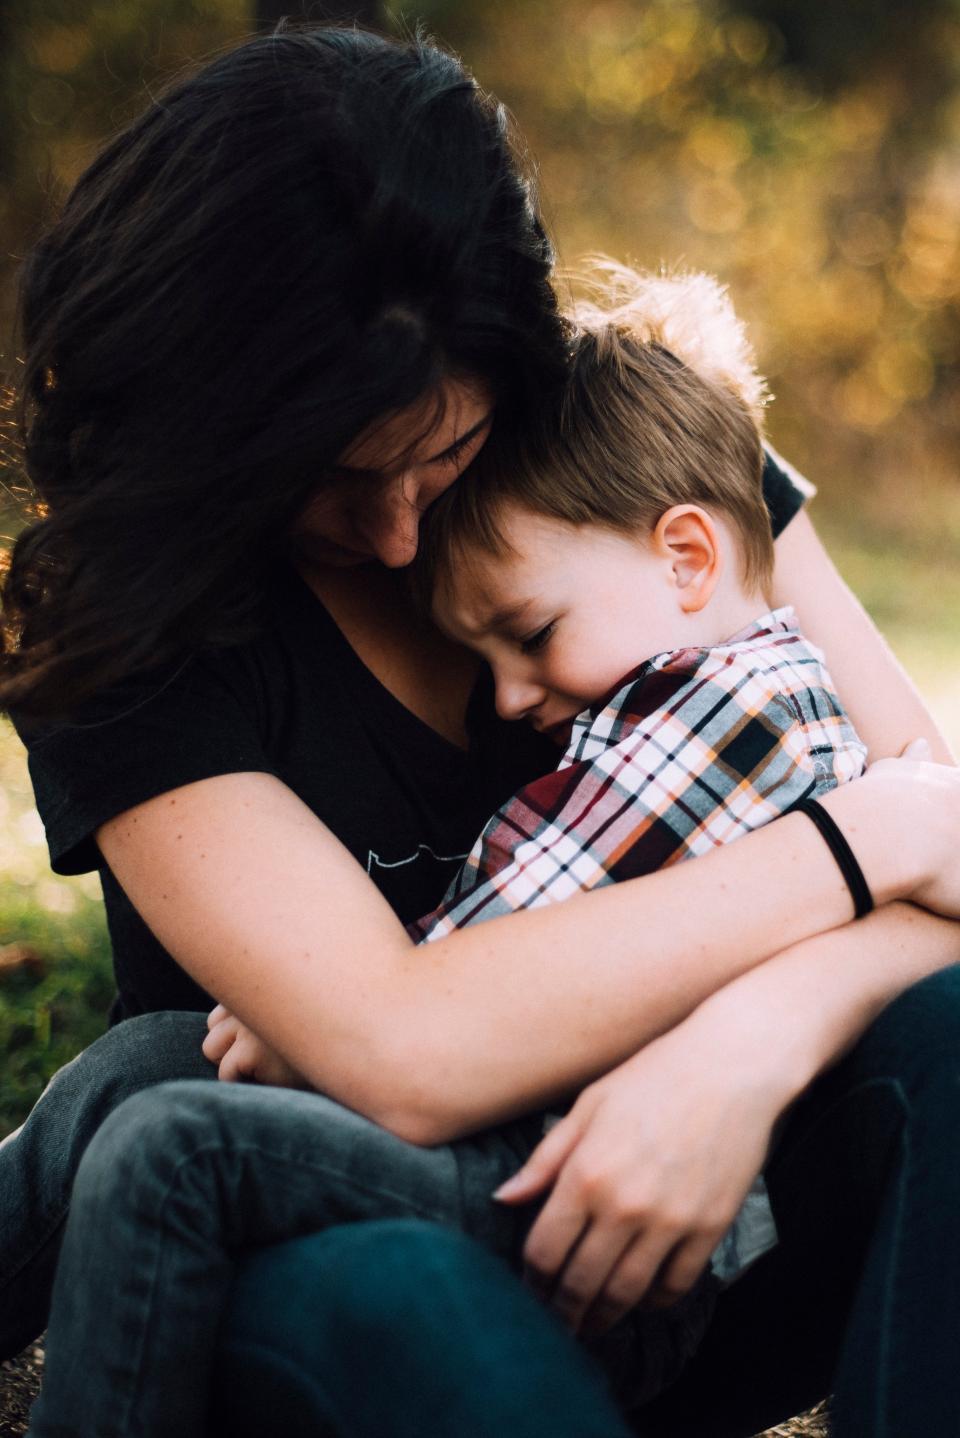 mother woman people kid baby child hug love parent sitting